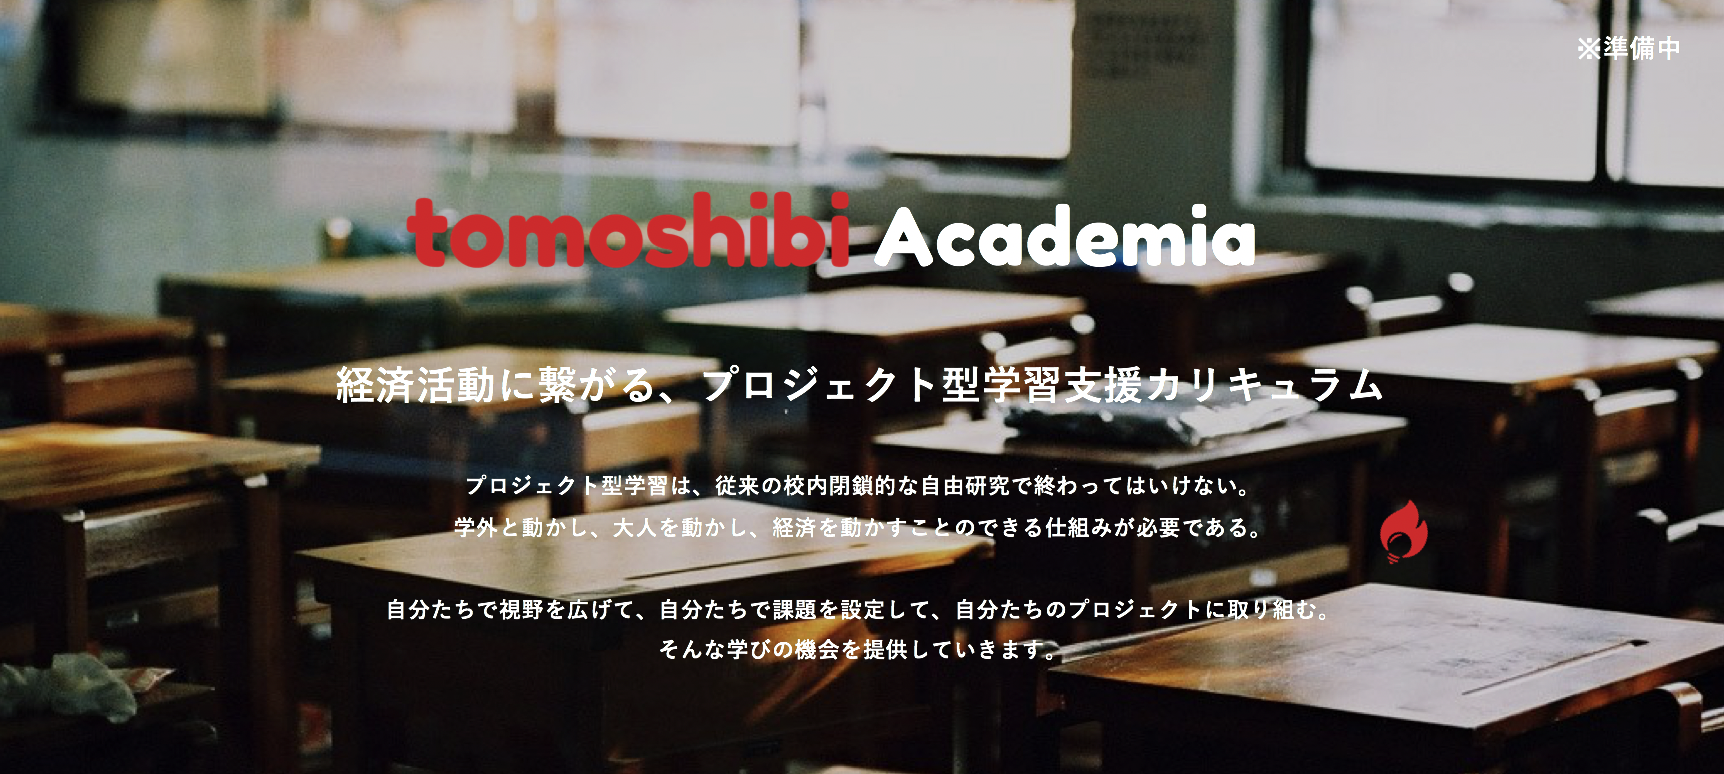 tomoshibi Academia